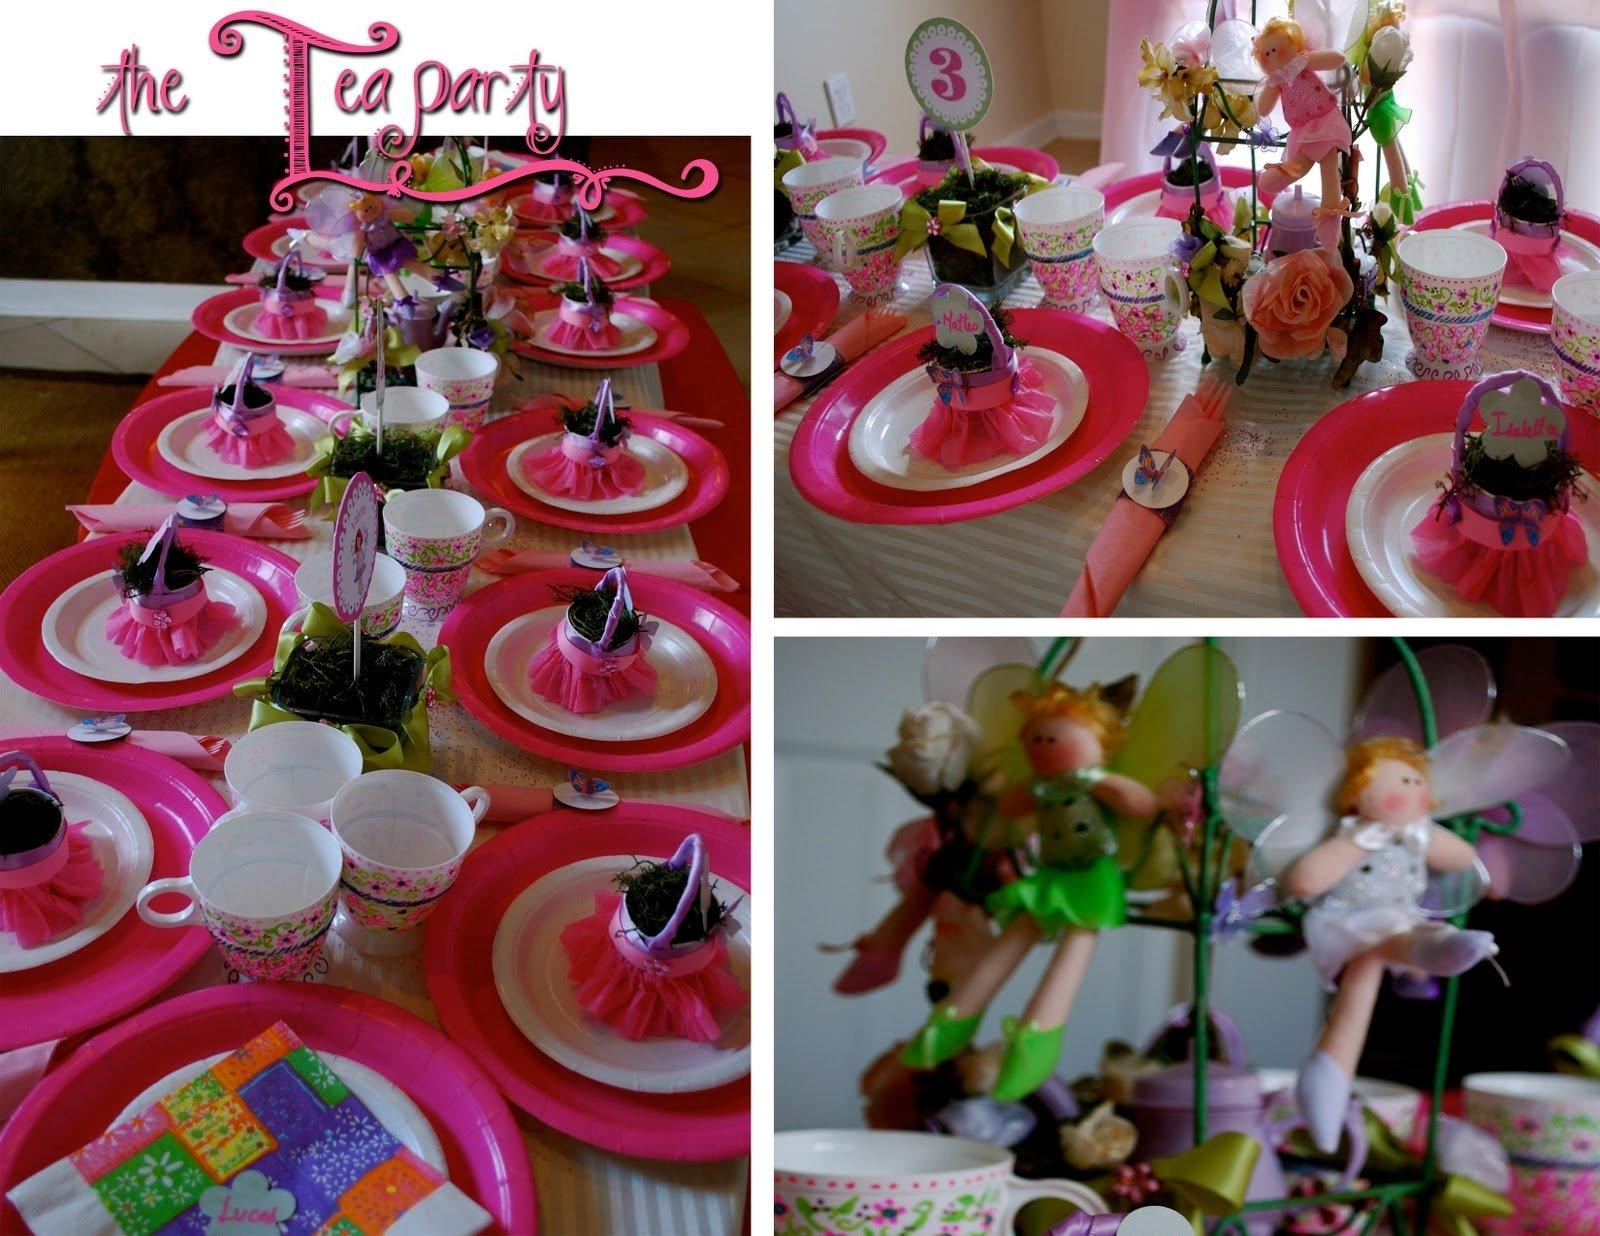 10 Spectacular Toddler Girl Birthday Party Ideas princess party food recipes 7000 little girl birthday ideas clipgoo 2020